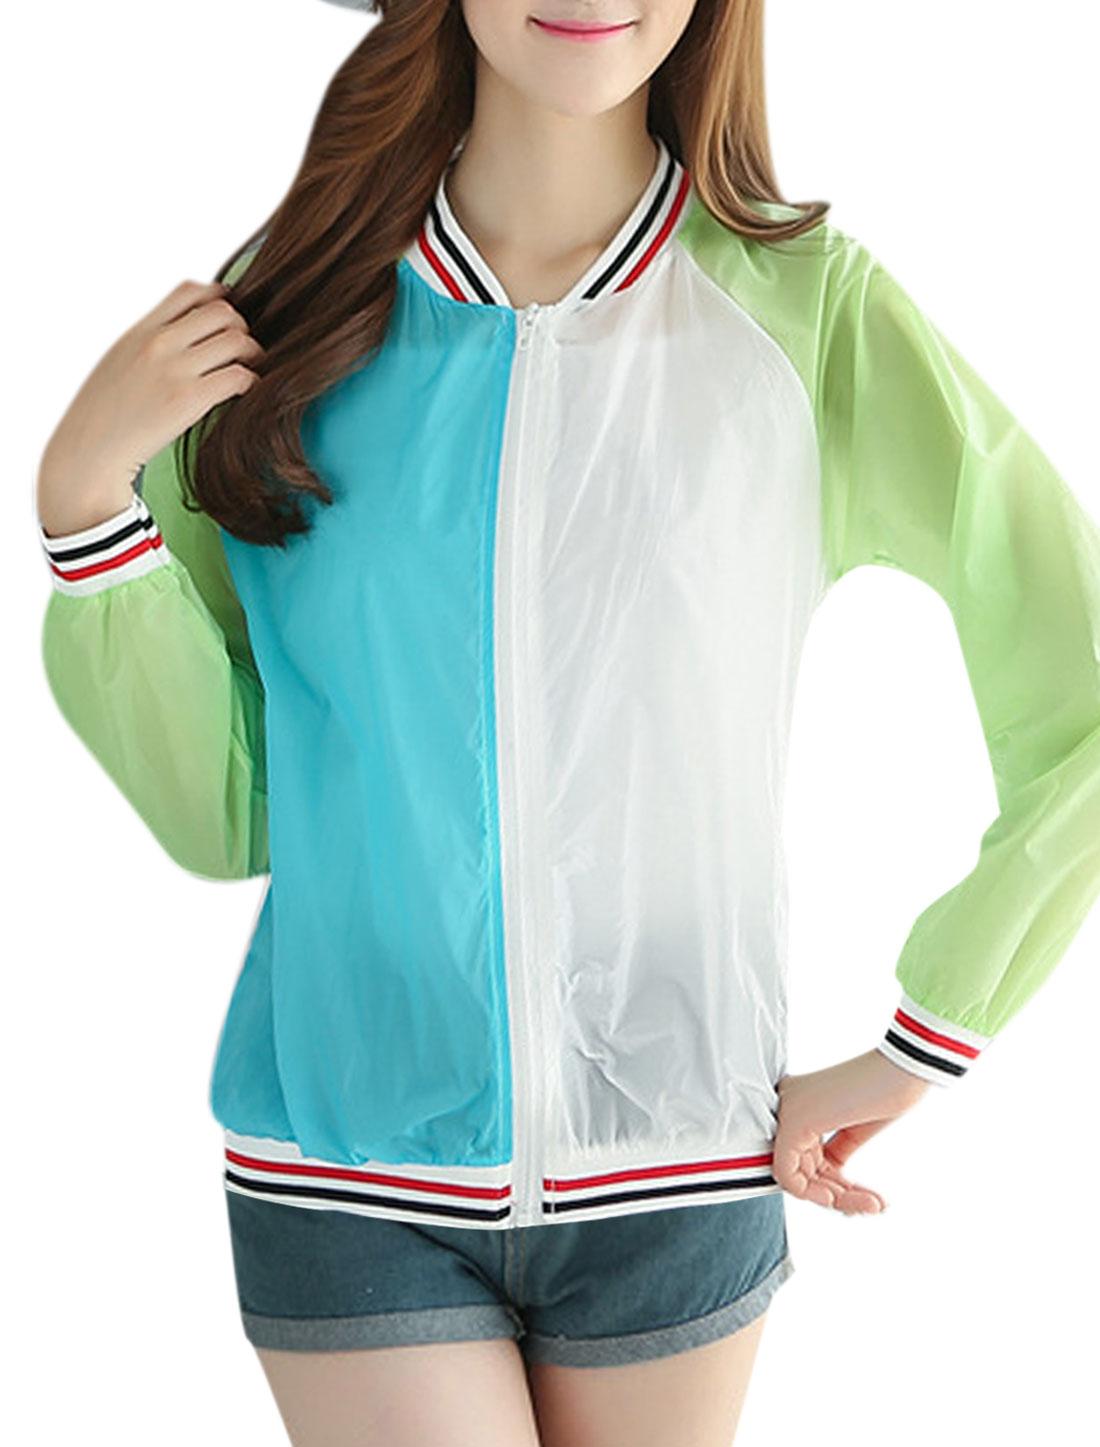 Lady Full Zip Stripes Trim Color Block Jackets Light Green XS